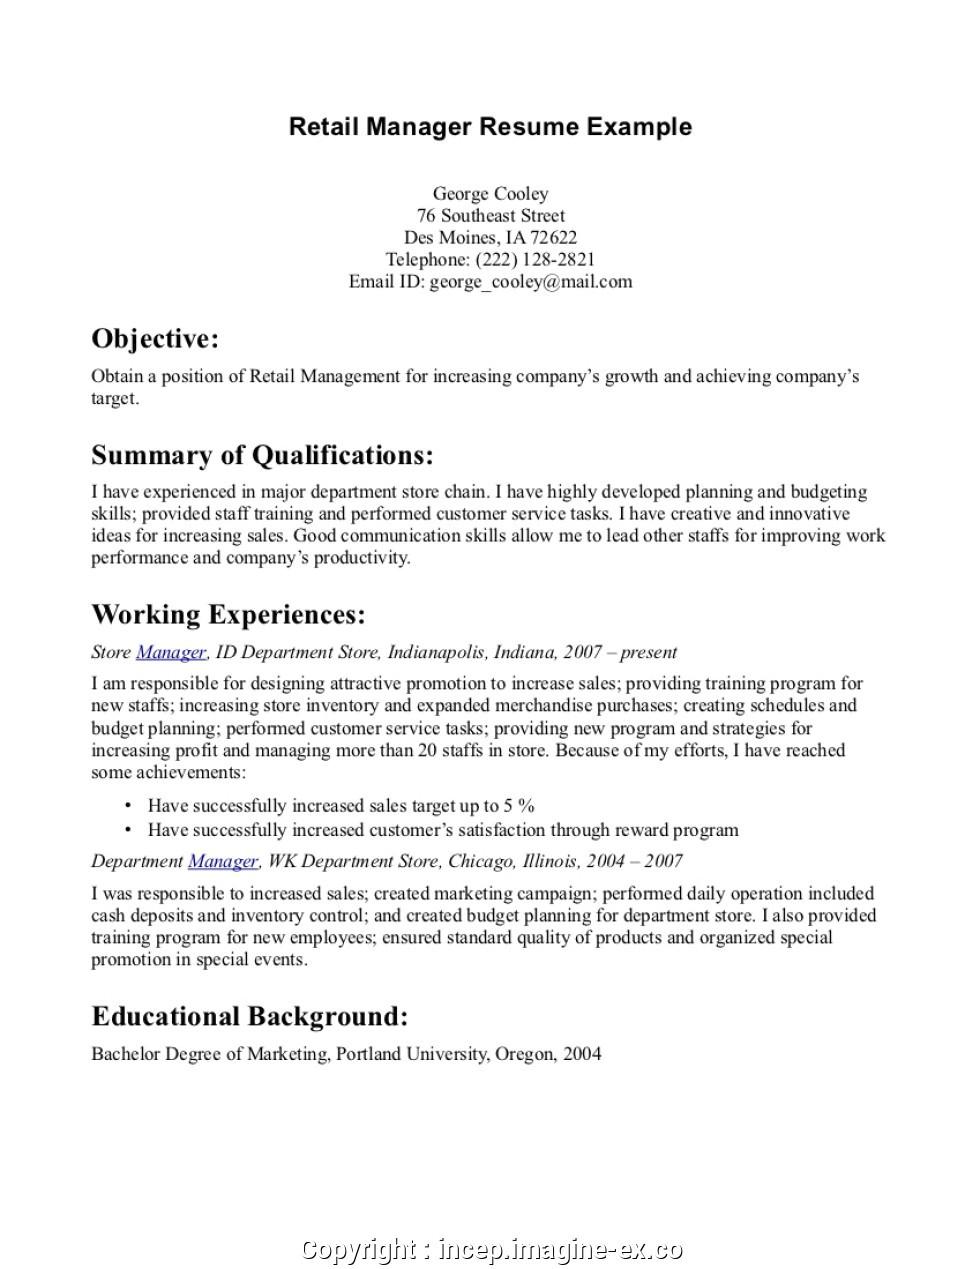 simple basic retail resume